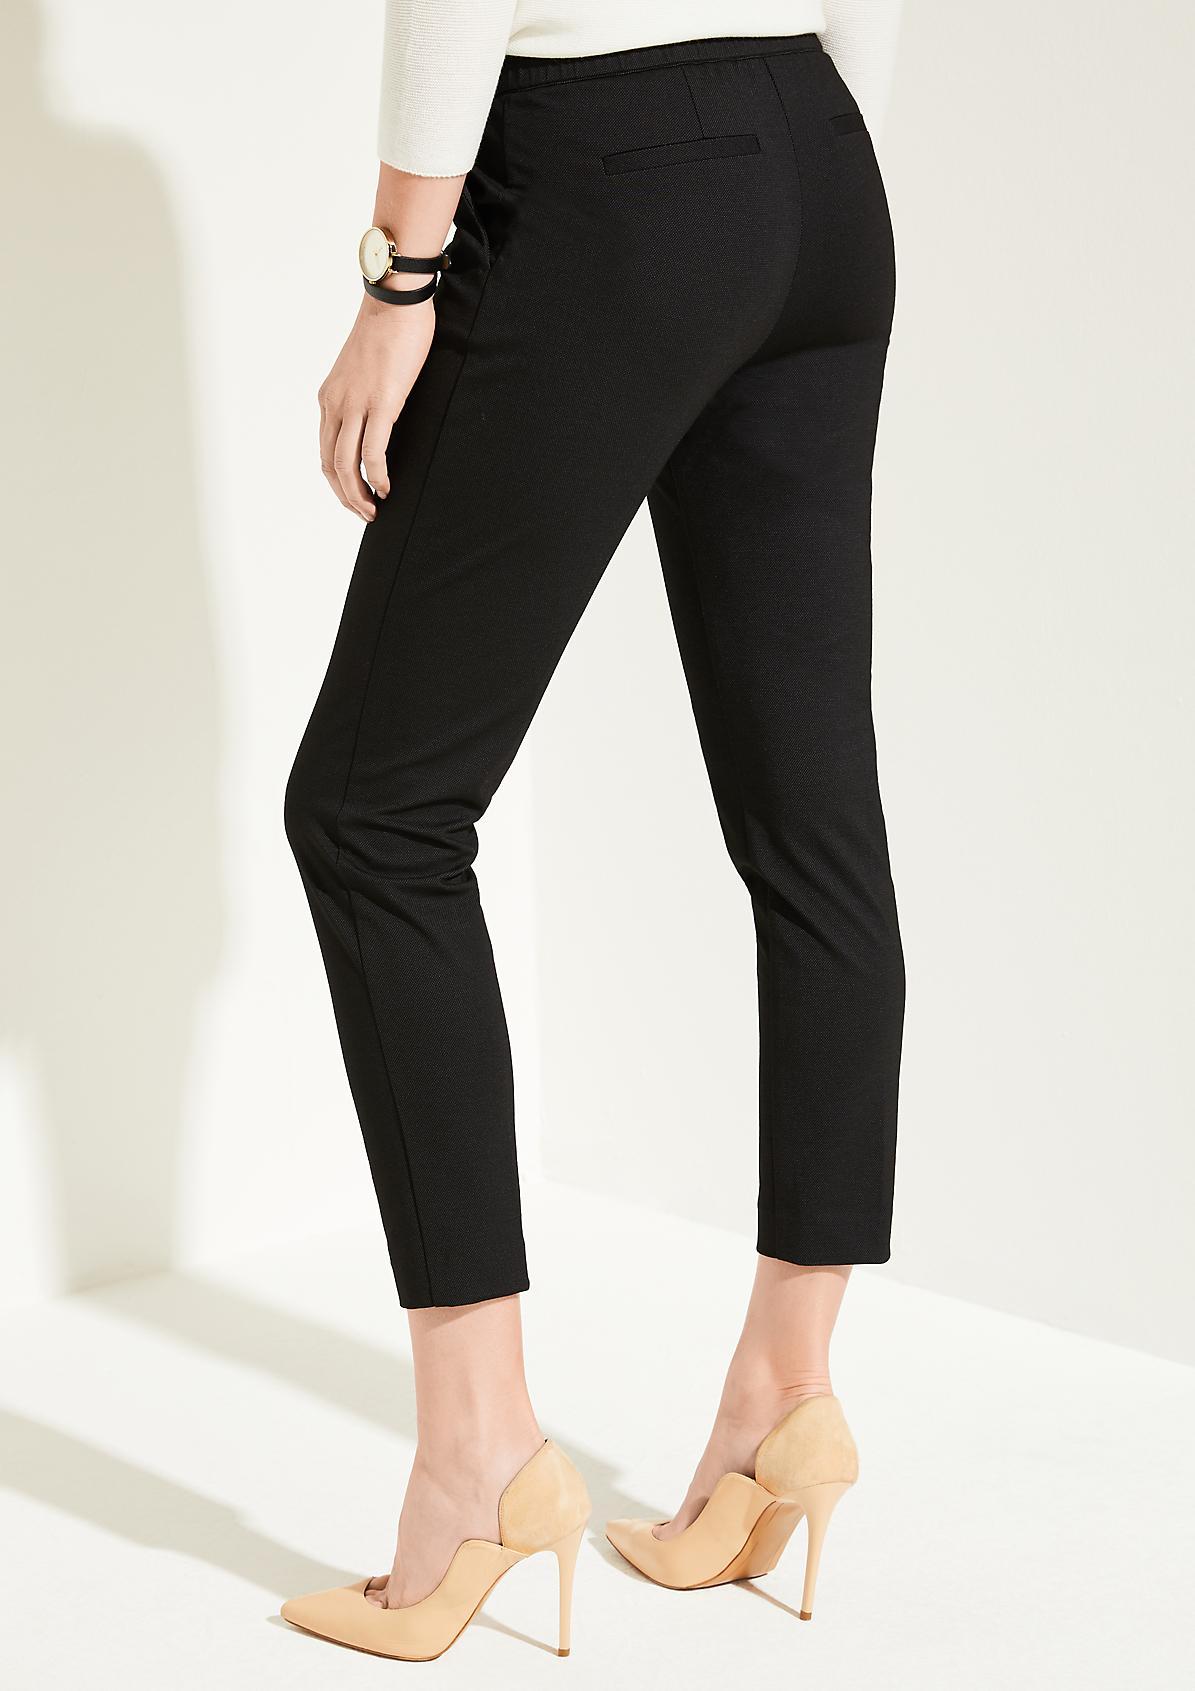 Loungepants mit aufregendem Minimalmuster